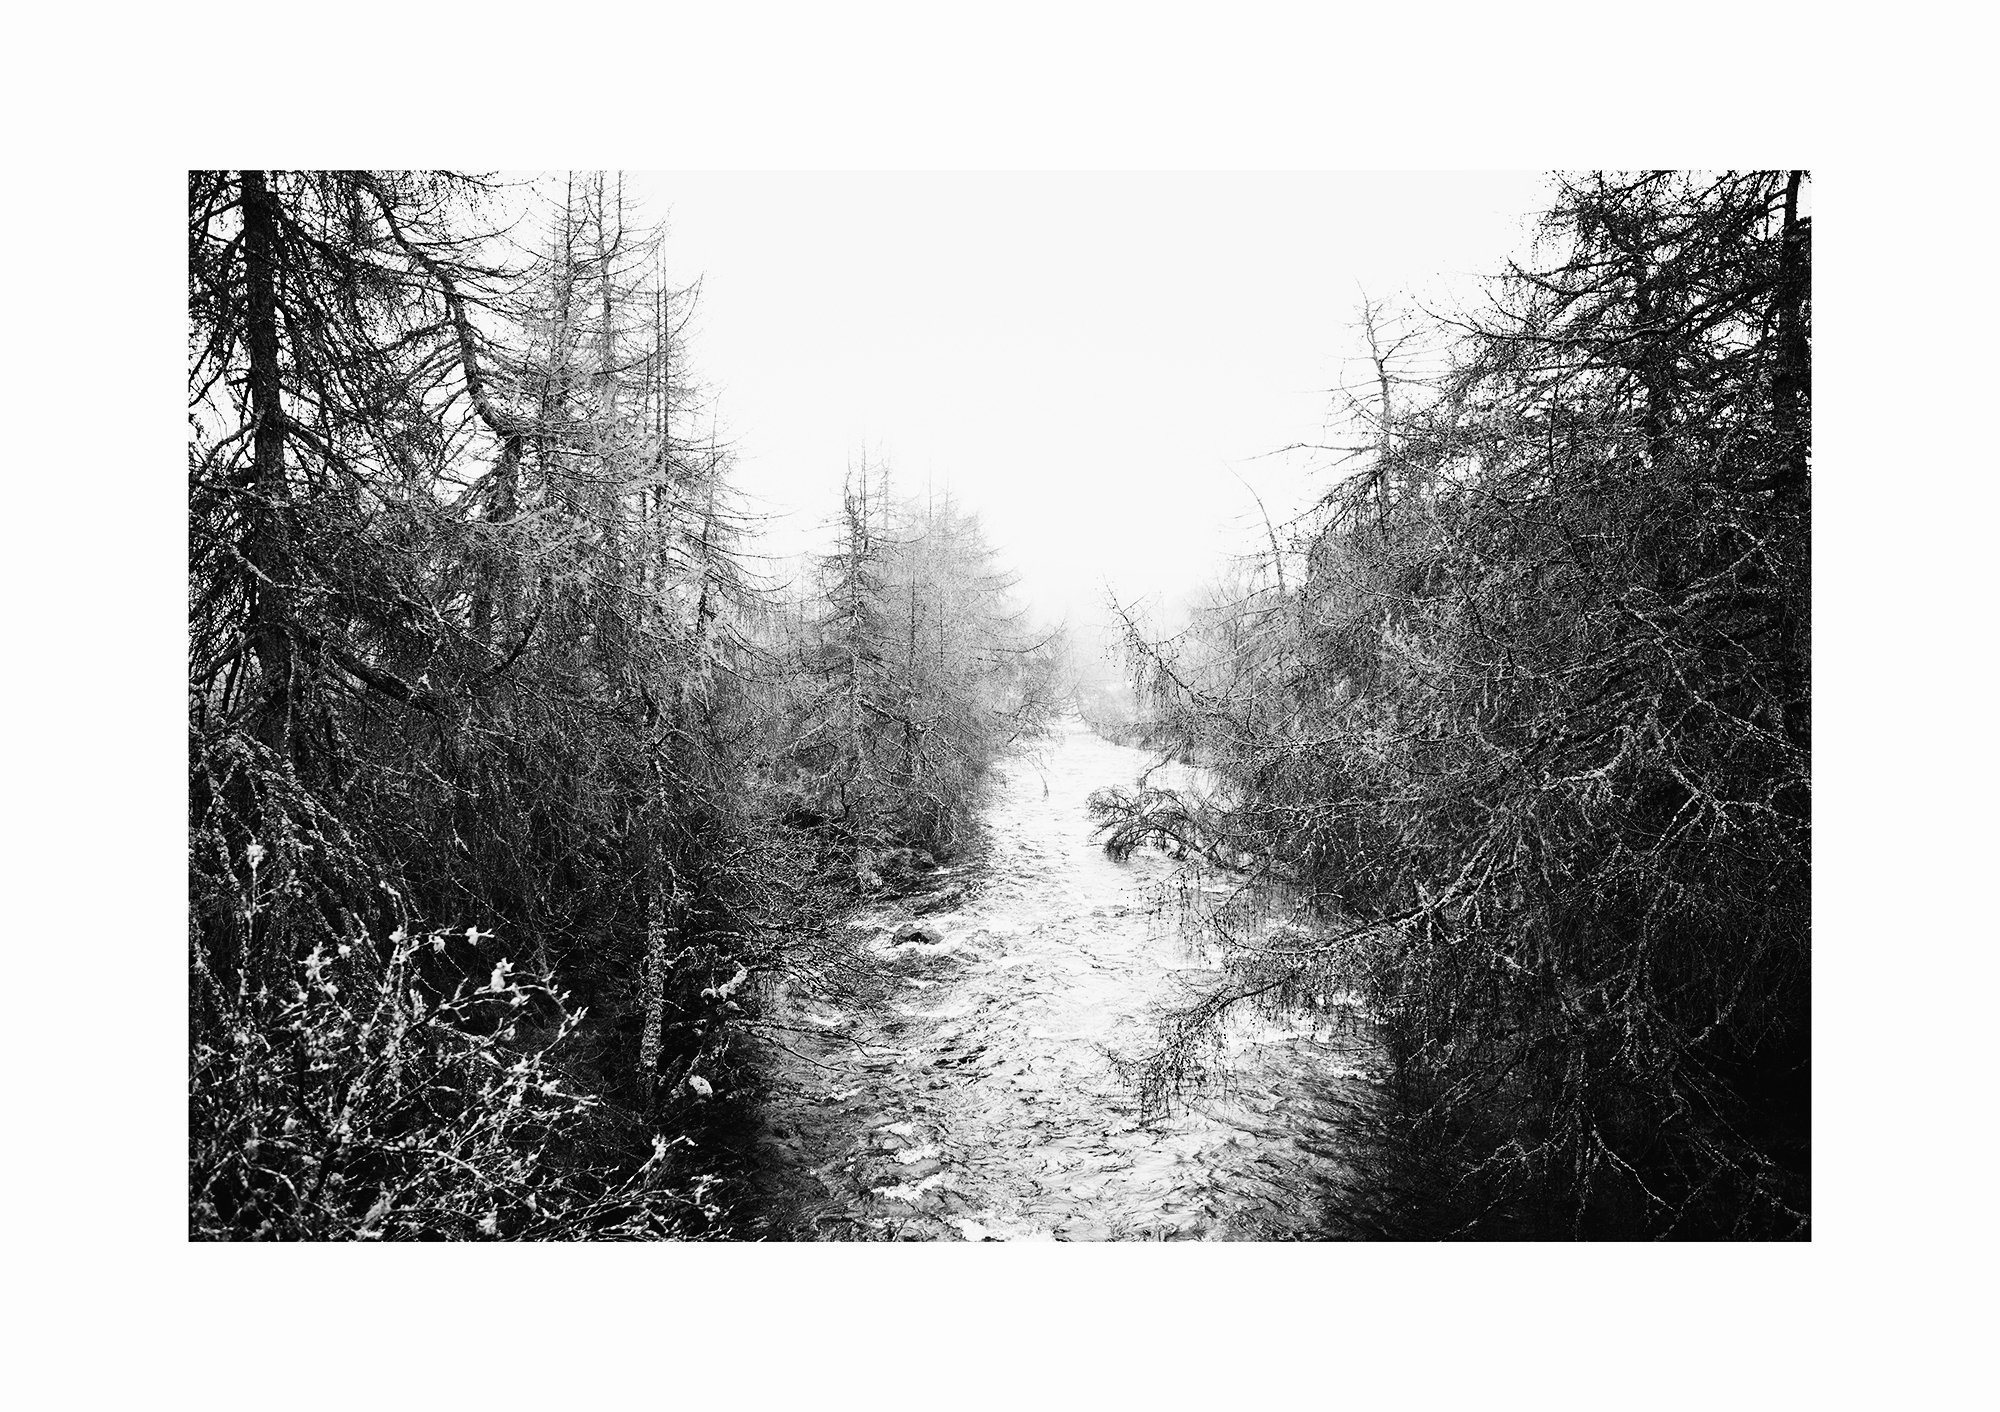 Highland river  copy.jpg